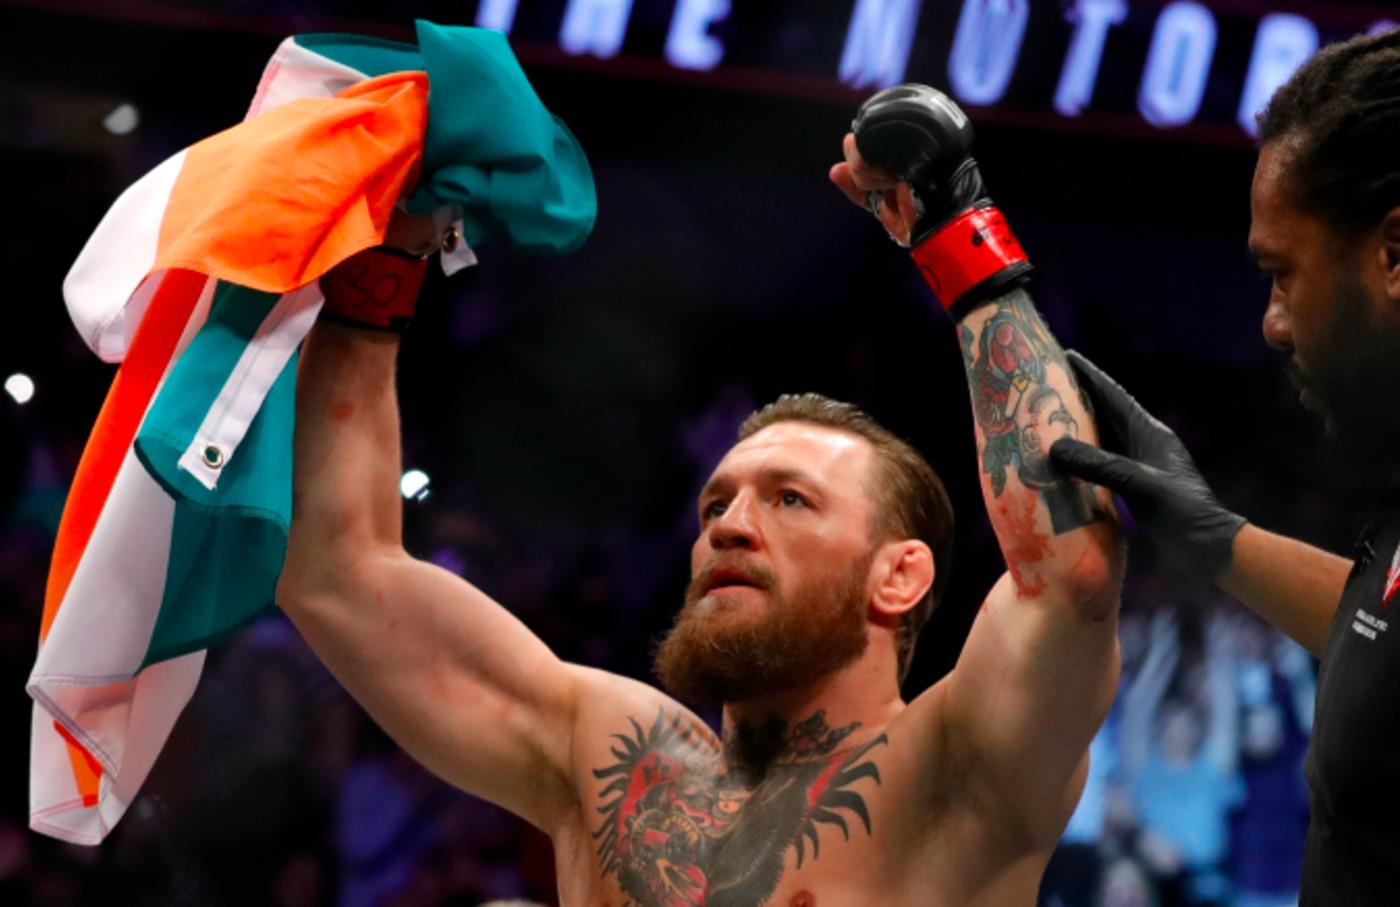 Conor McGregor celebrates after defeating Donald Cerrone